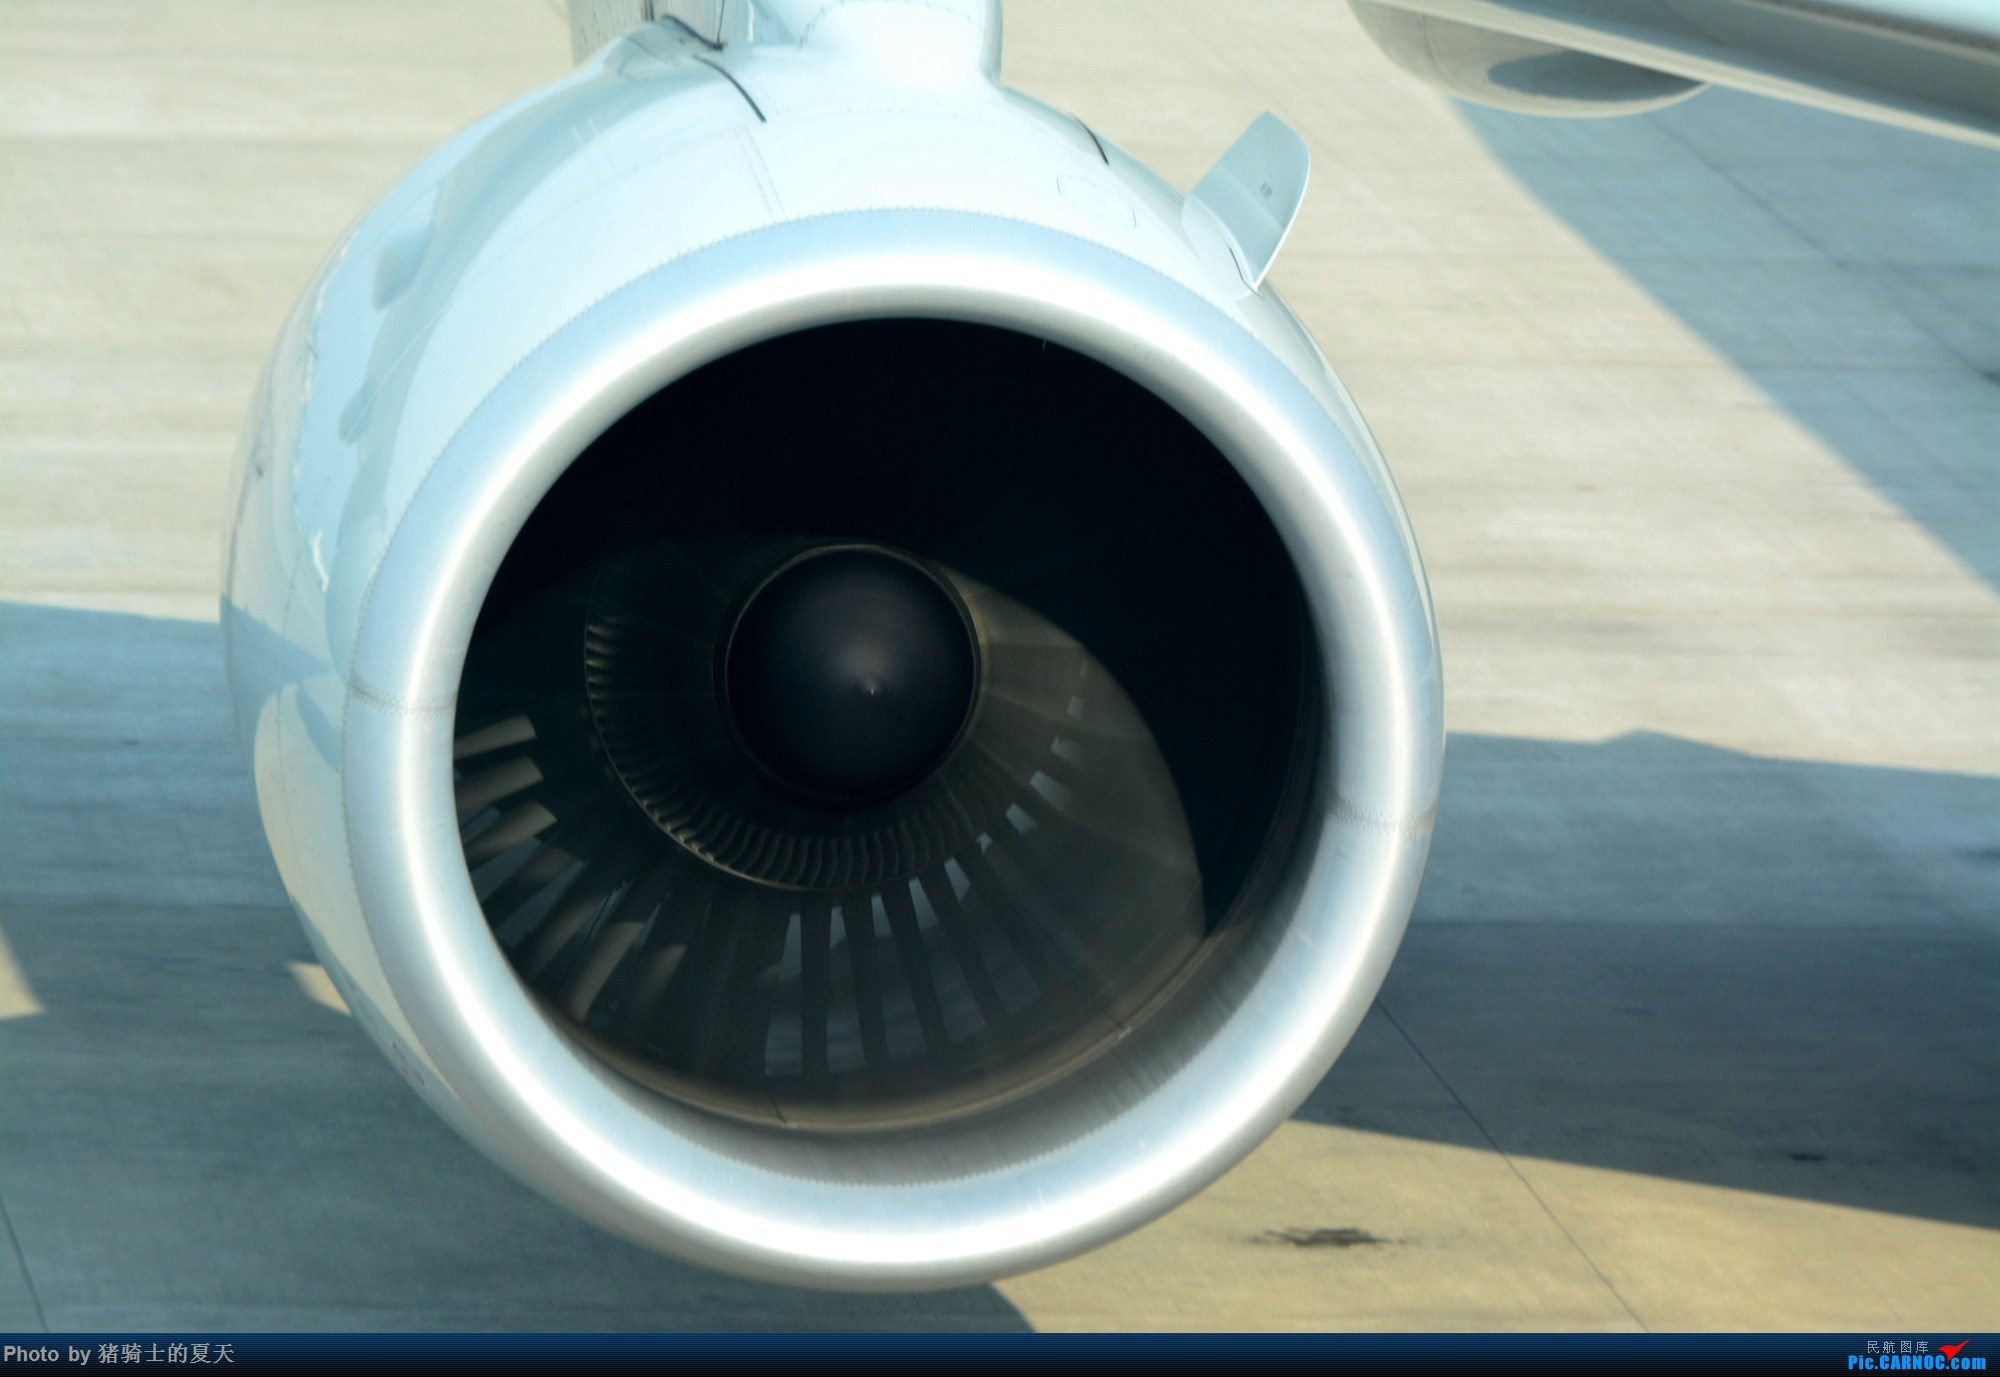 Re:[原创]2017年鸡鸭图 BOEING 747-8I B-2481 中国上海虹桥国际机场